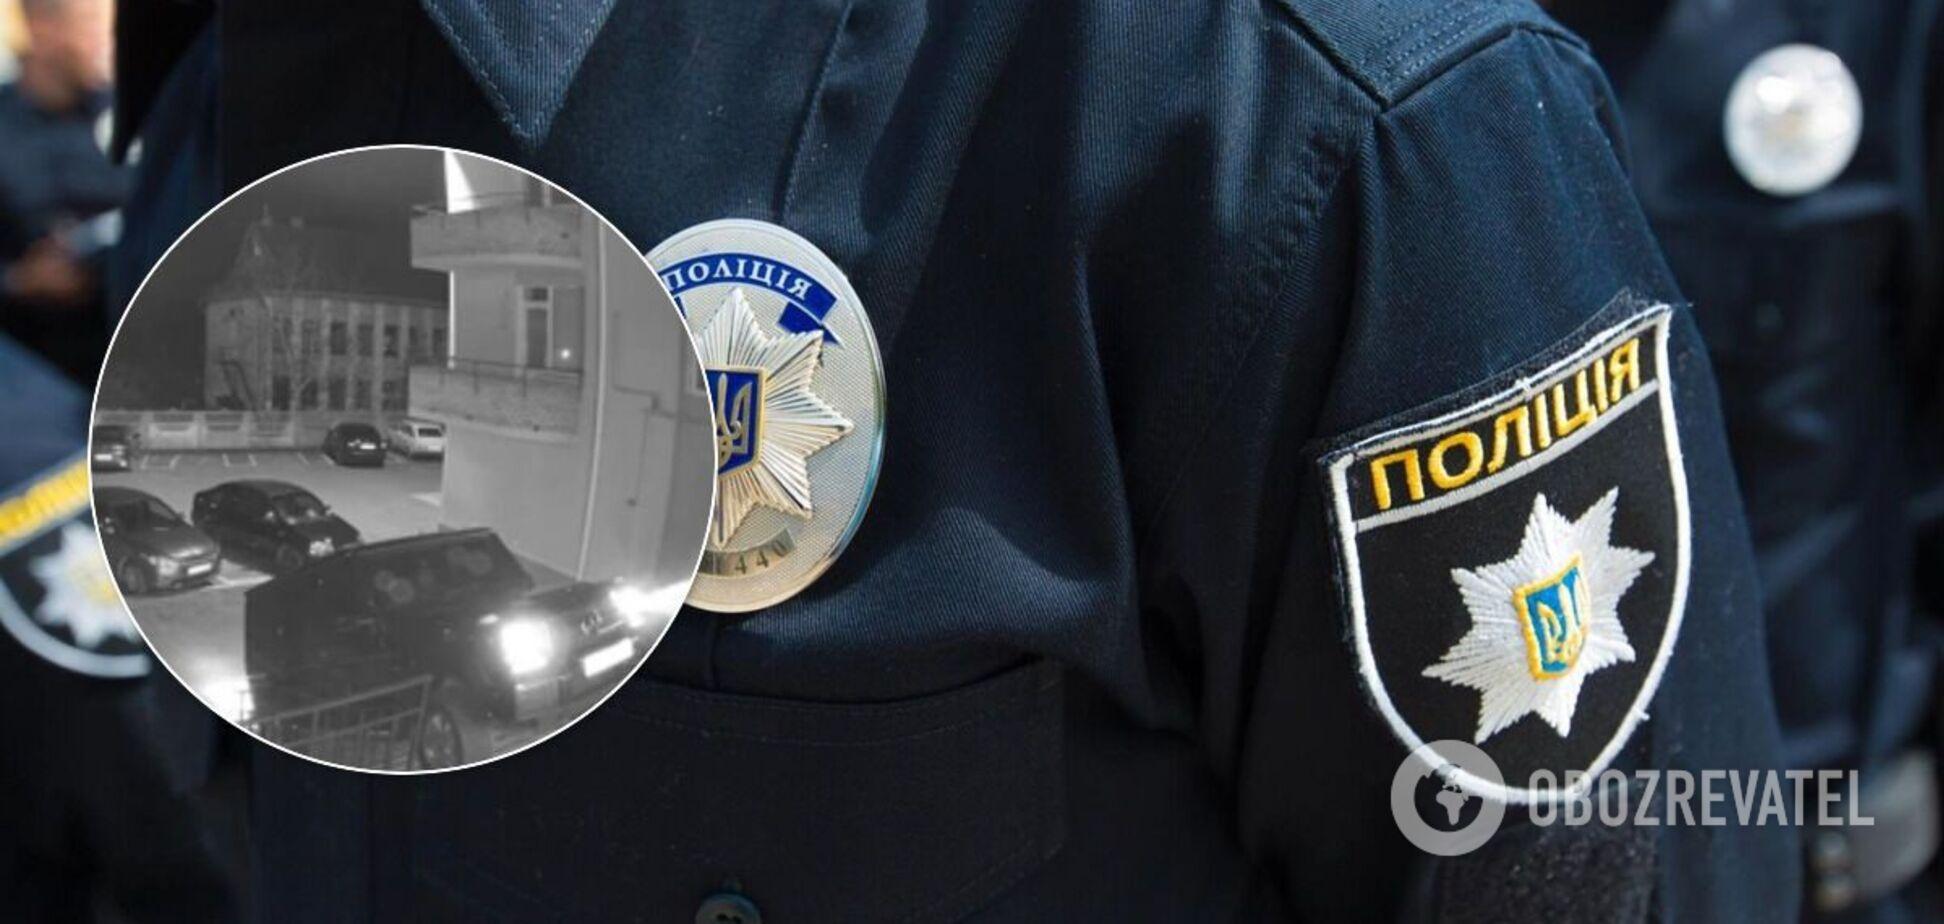 Поліція оштрафувала депутатів